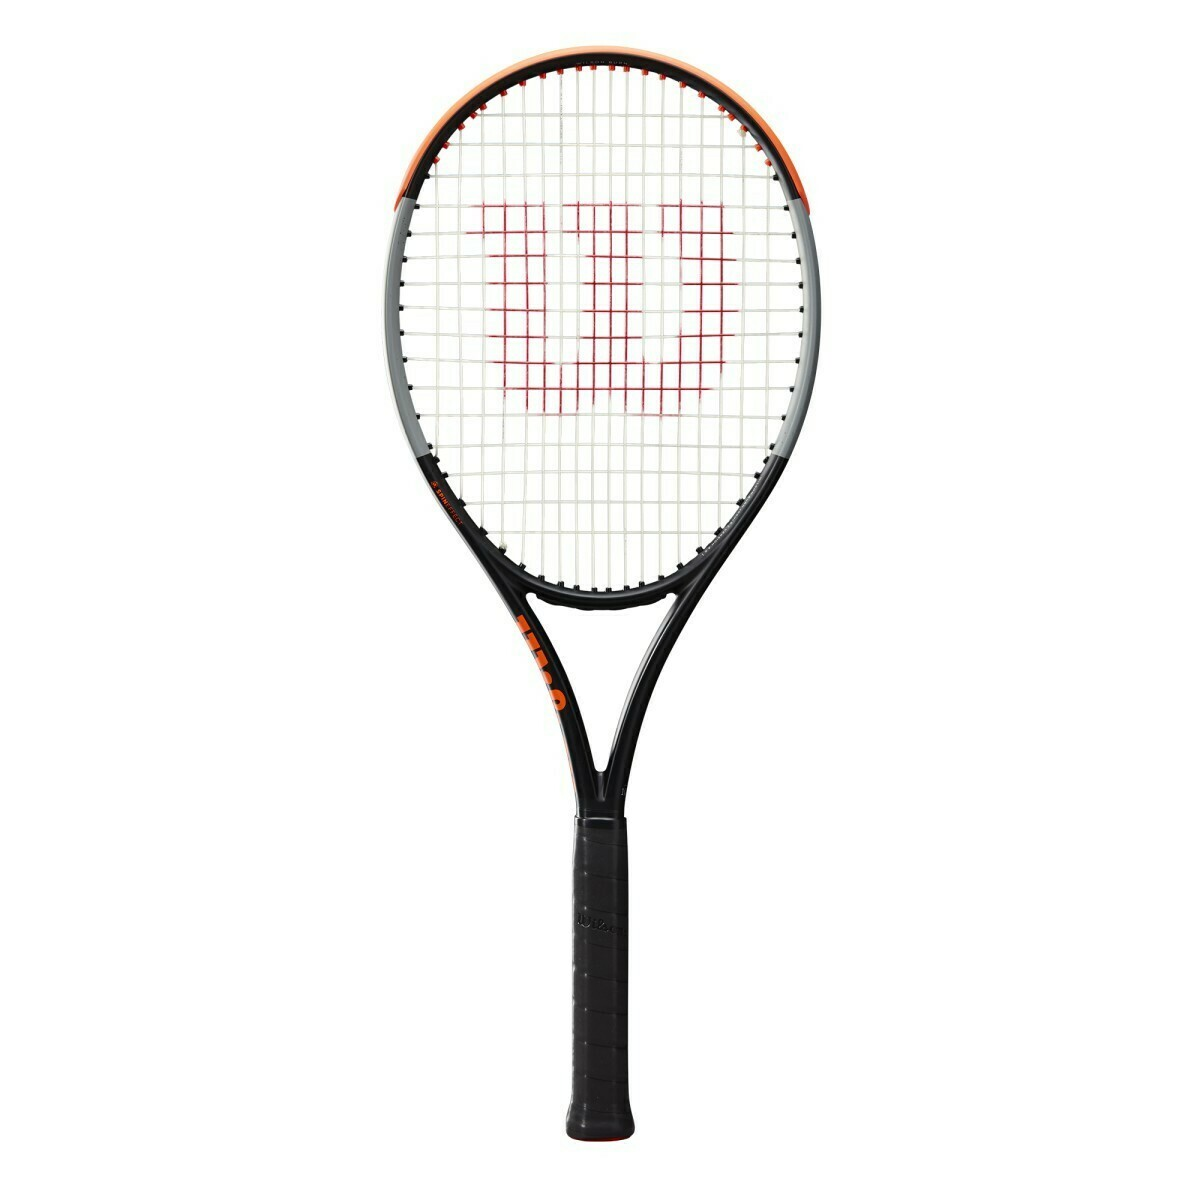 Wilson Burn 100ULS V4.0 Tennis Racket - Black